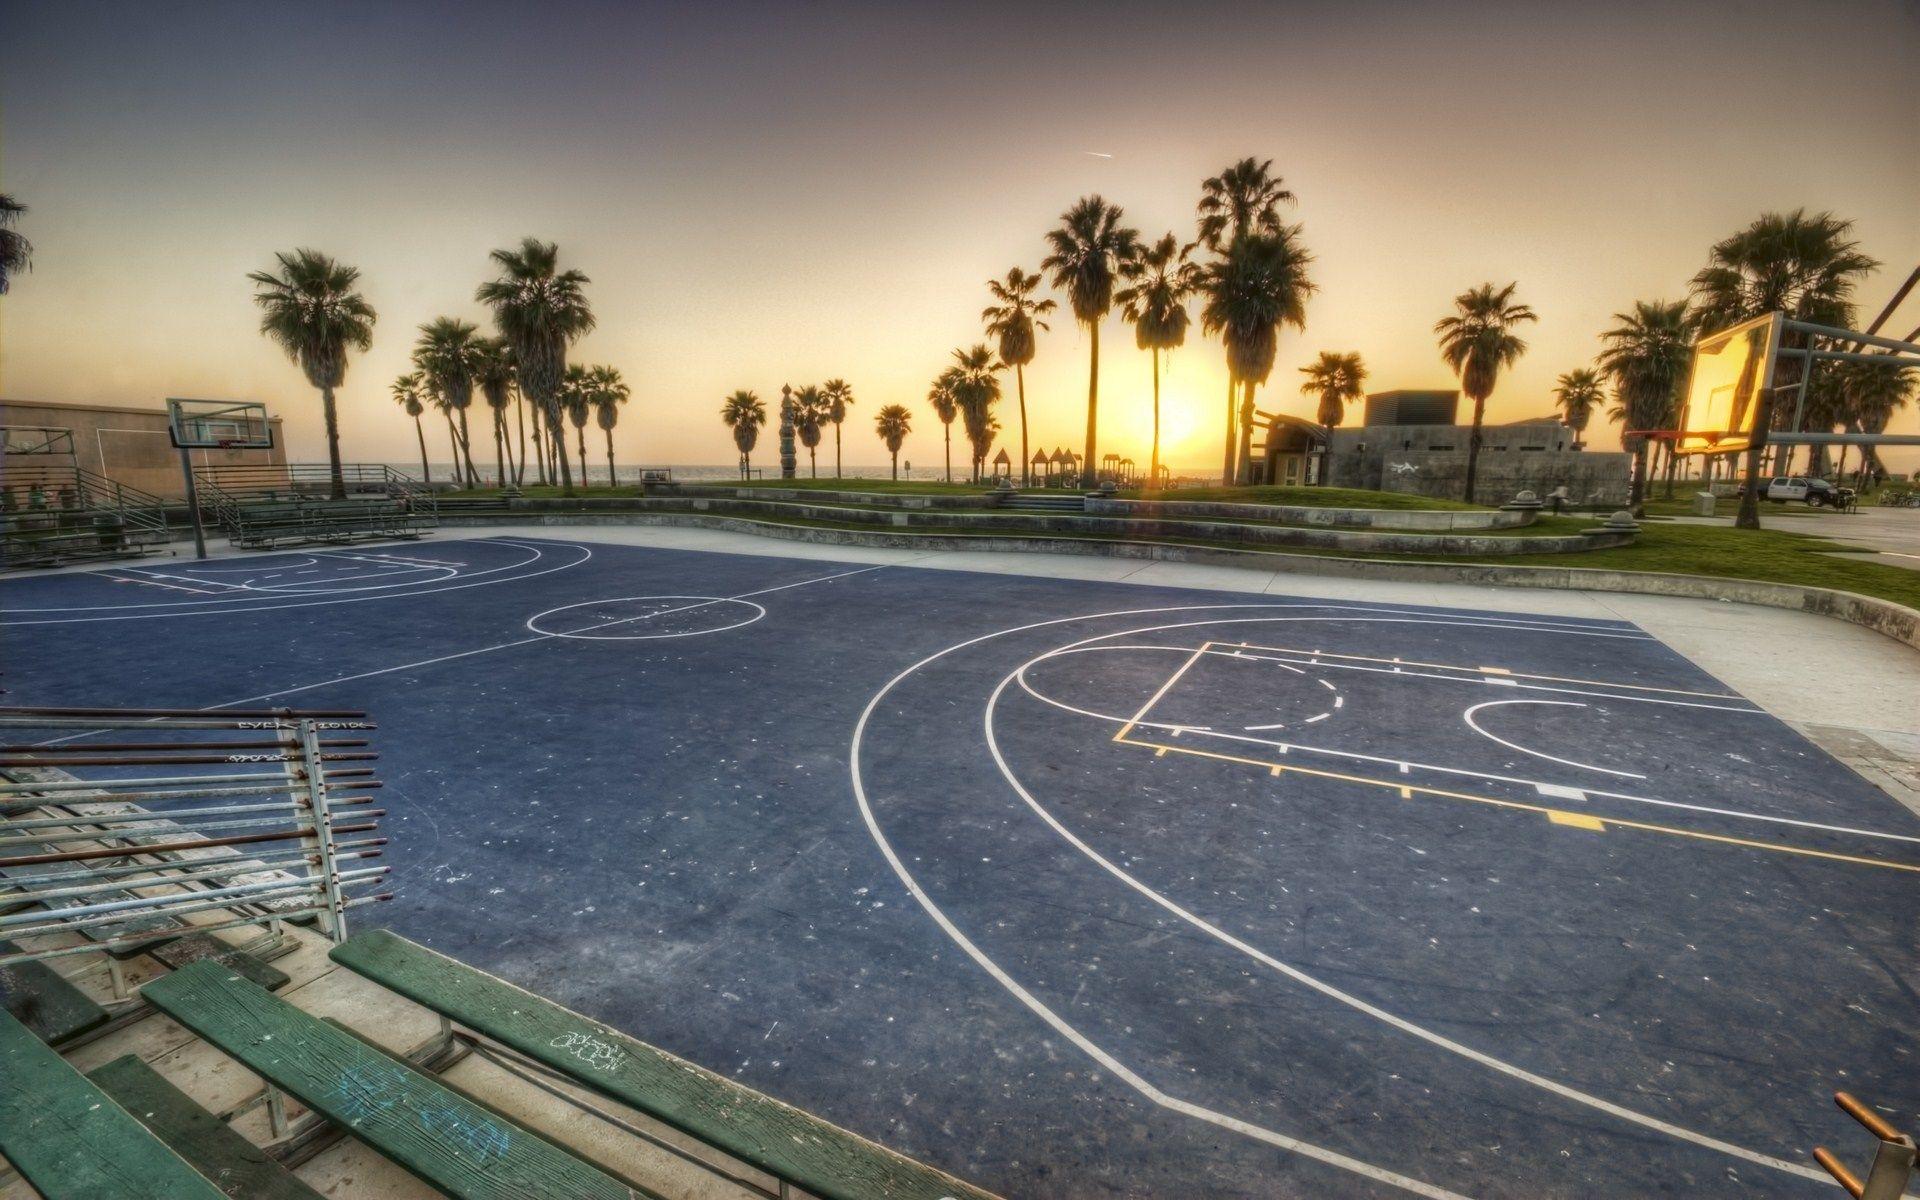 48] Venice Beach Basketball Wallpaper on WallpaperSafari 1920x1200